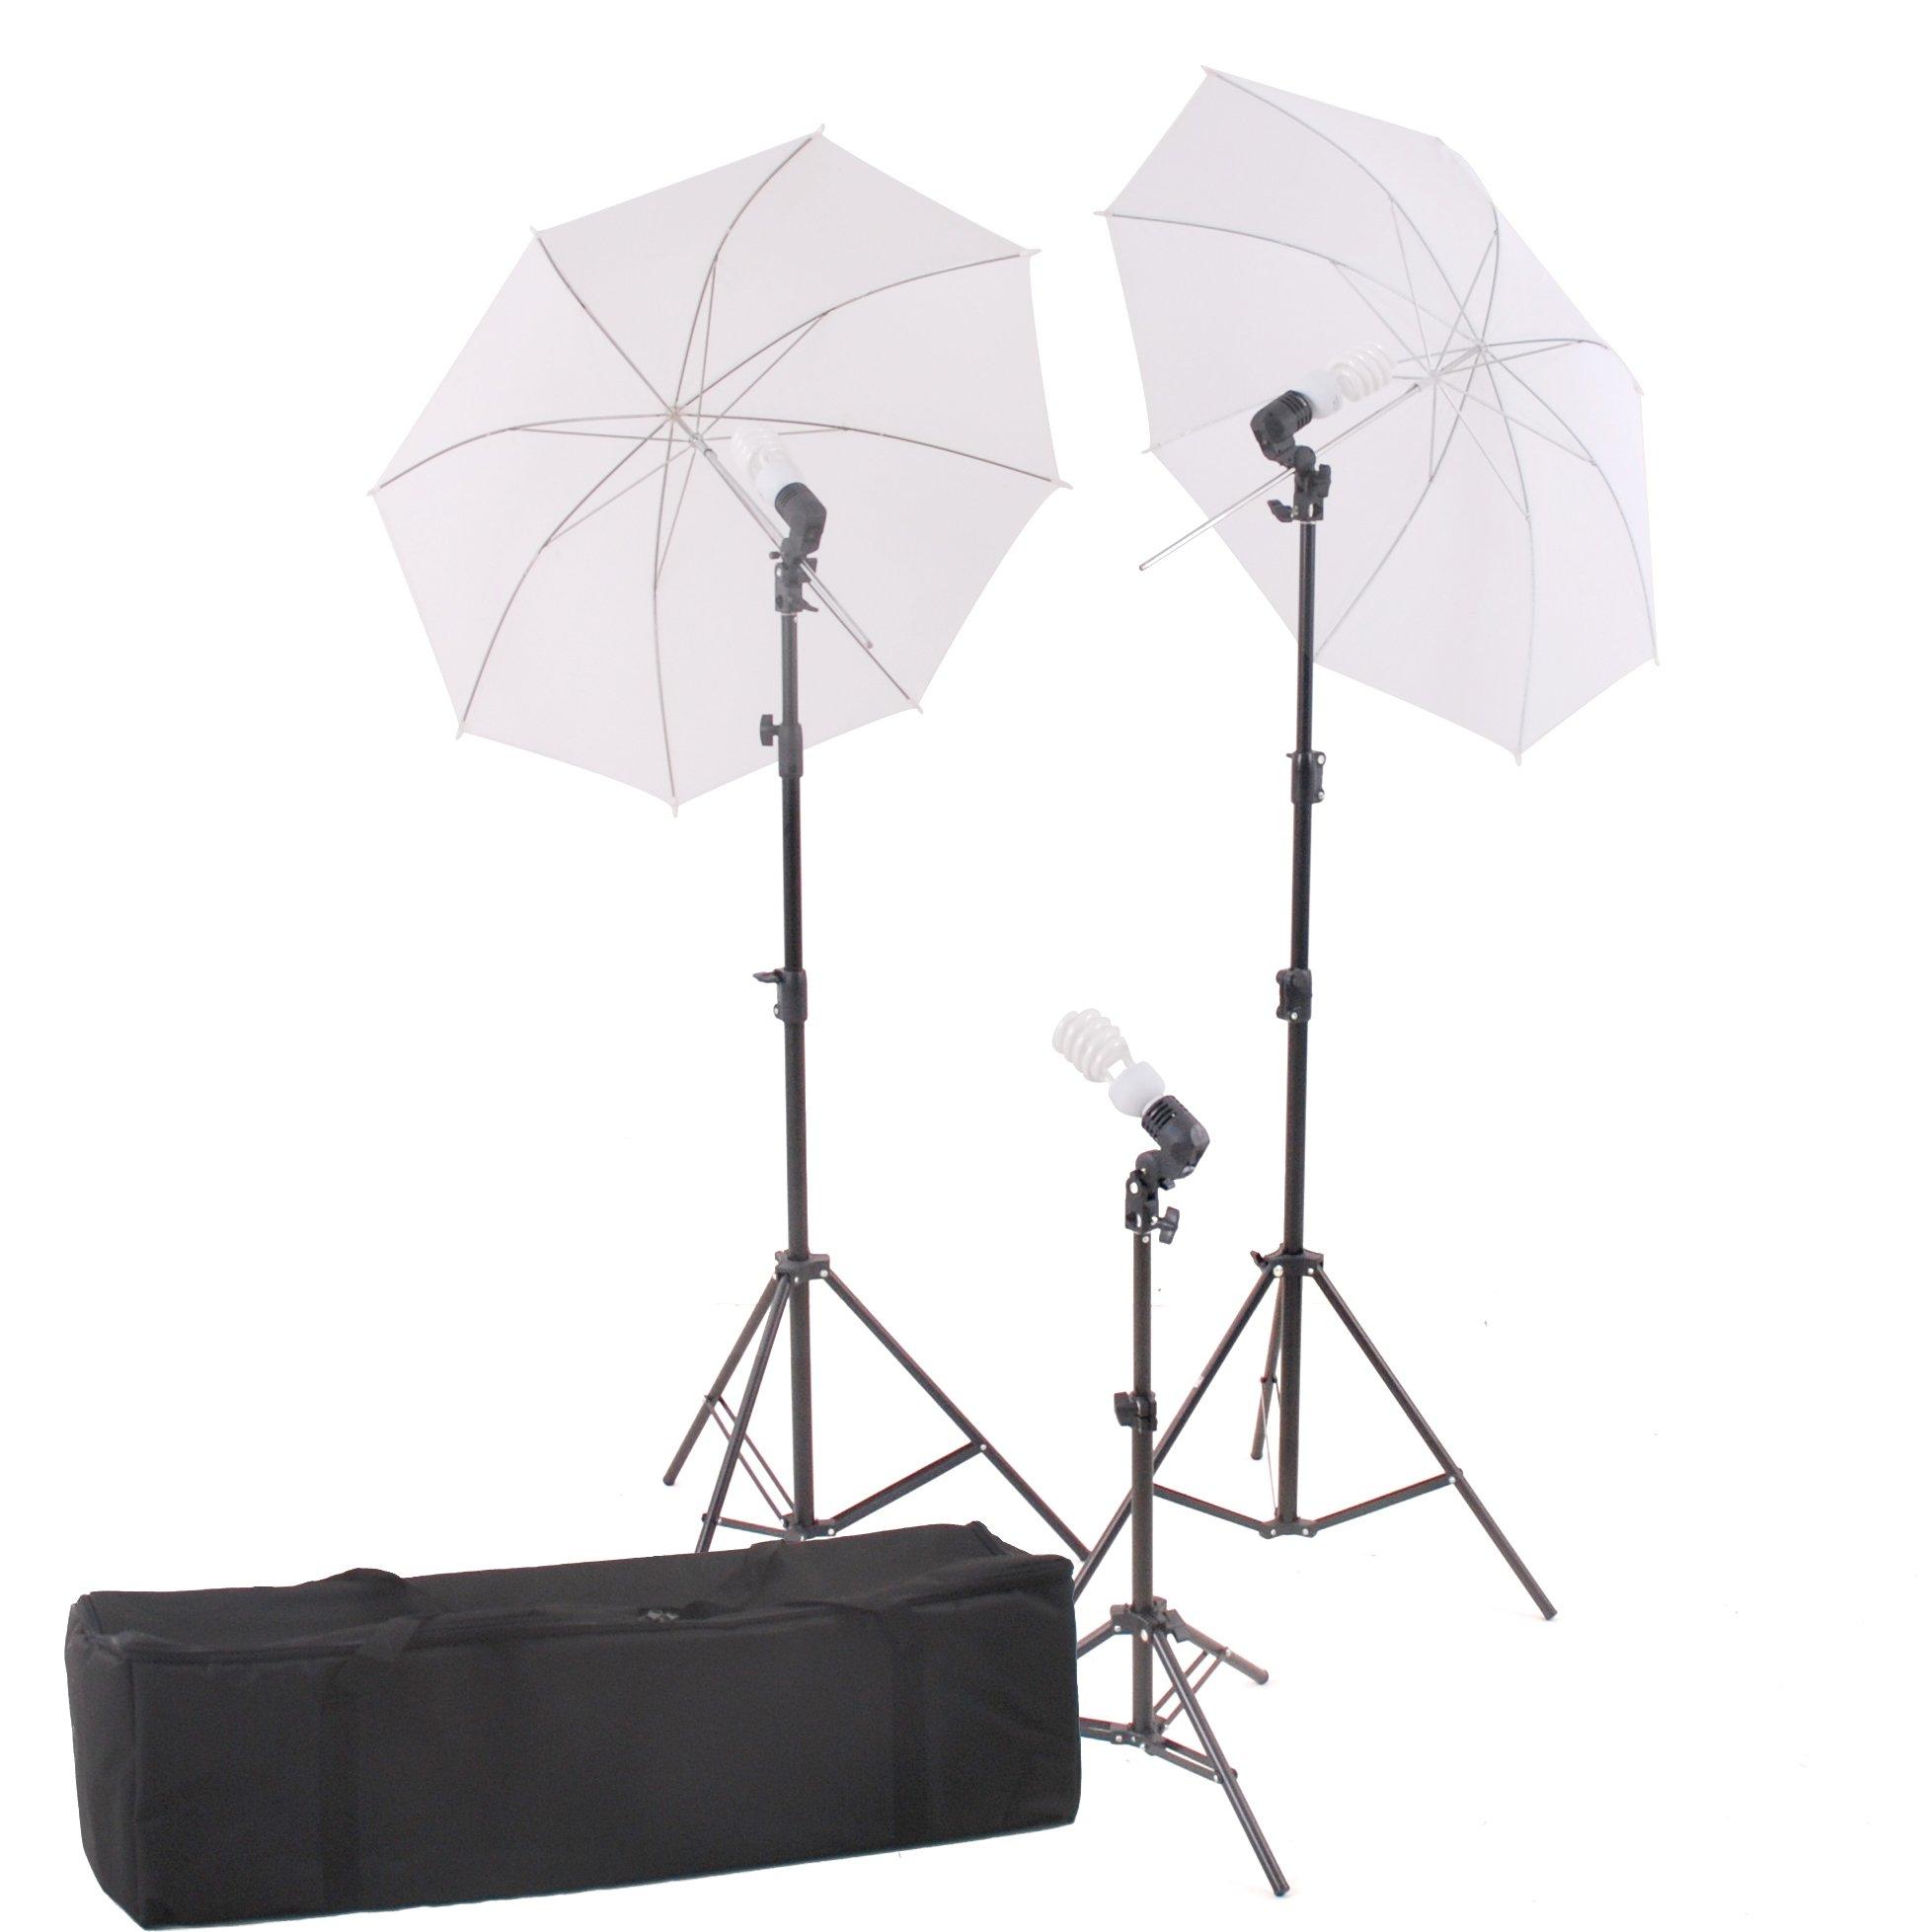 StudioFX Photography Photo Portrait Studio 600W Day Light Umbrella Continuous Lighting Kit by Kaezi CHDK3 by StudioFX